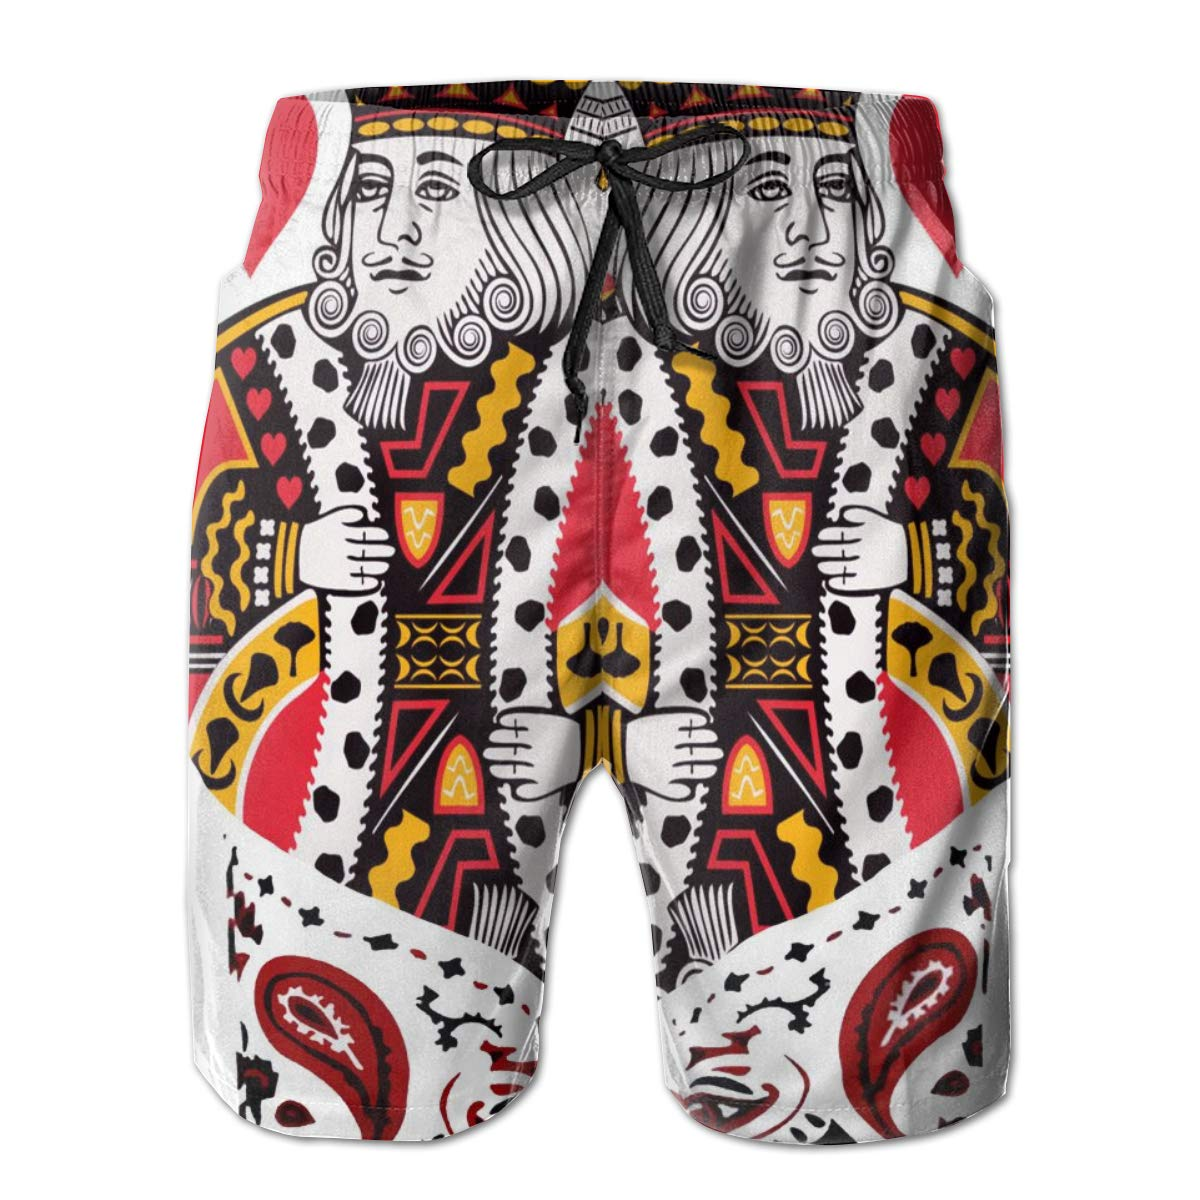 HHHDAM Men Swim Trunks Poker Card Beach Wear Swim Casual Sports Shorts Quick Dry Swimwear for Summer